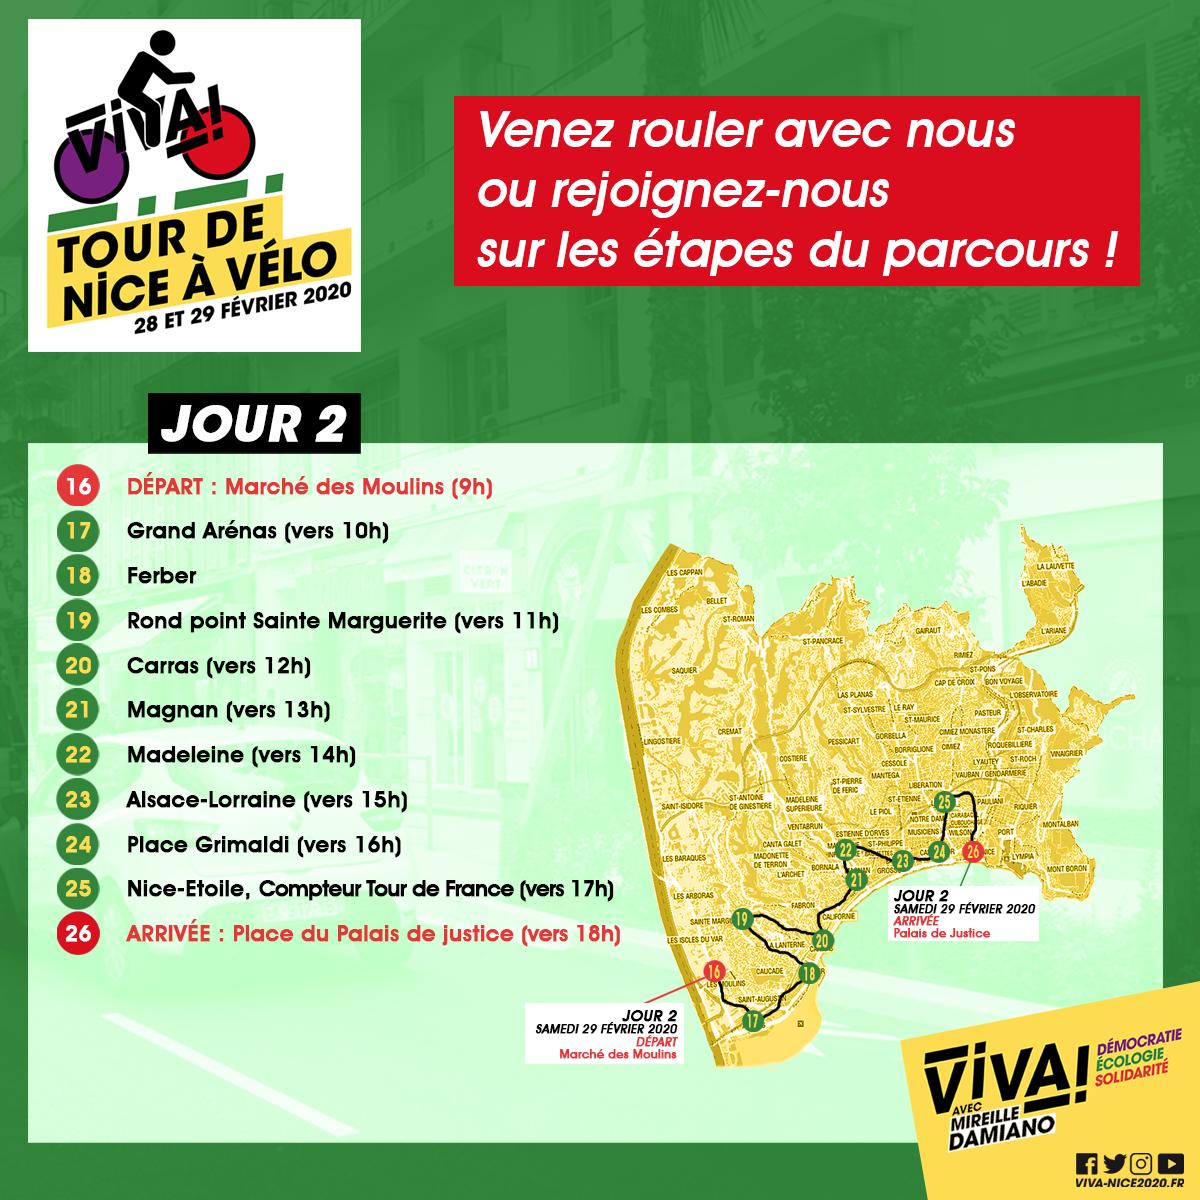 ViVA! Tour de Nice Jour 2